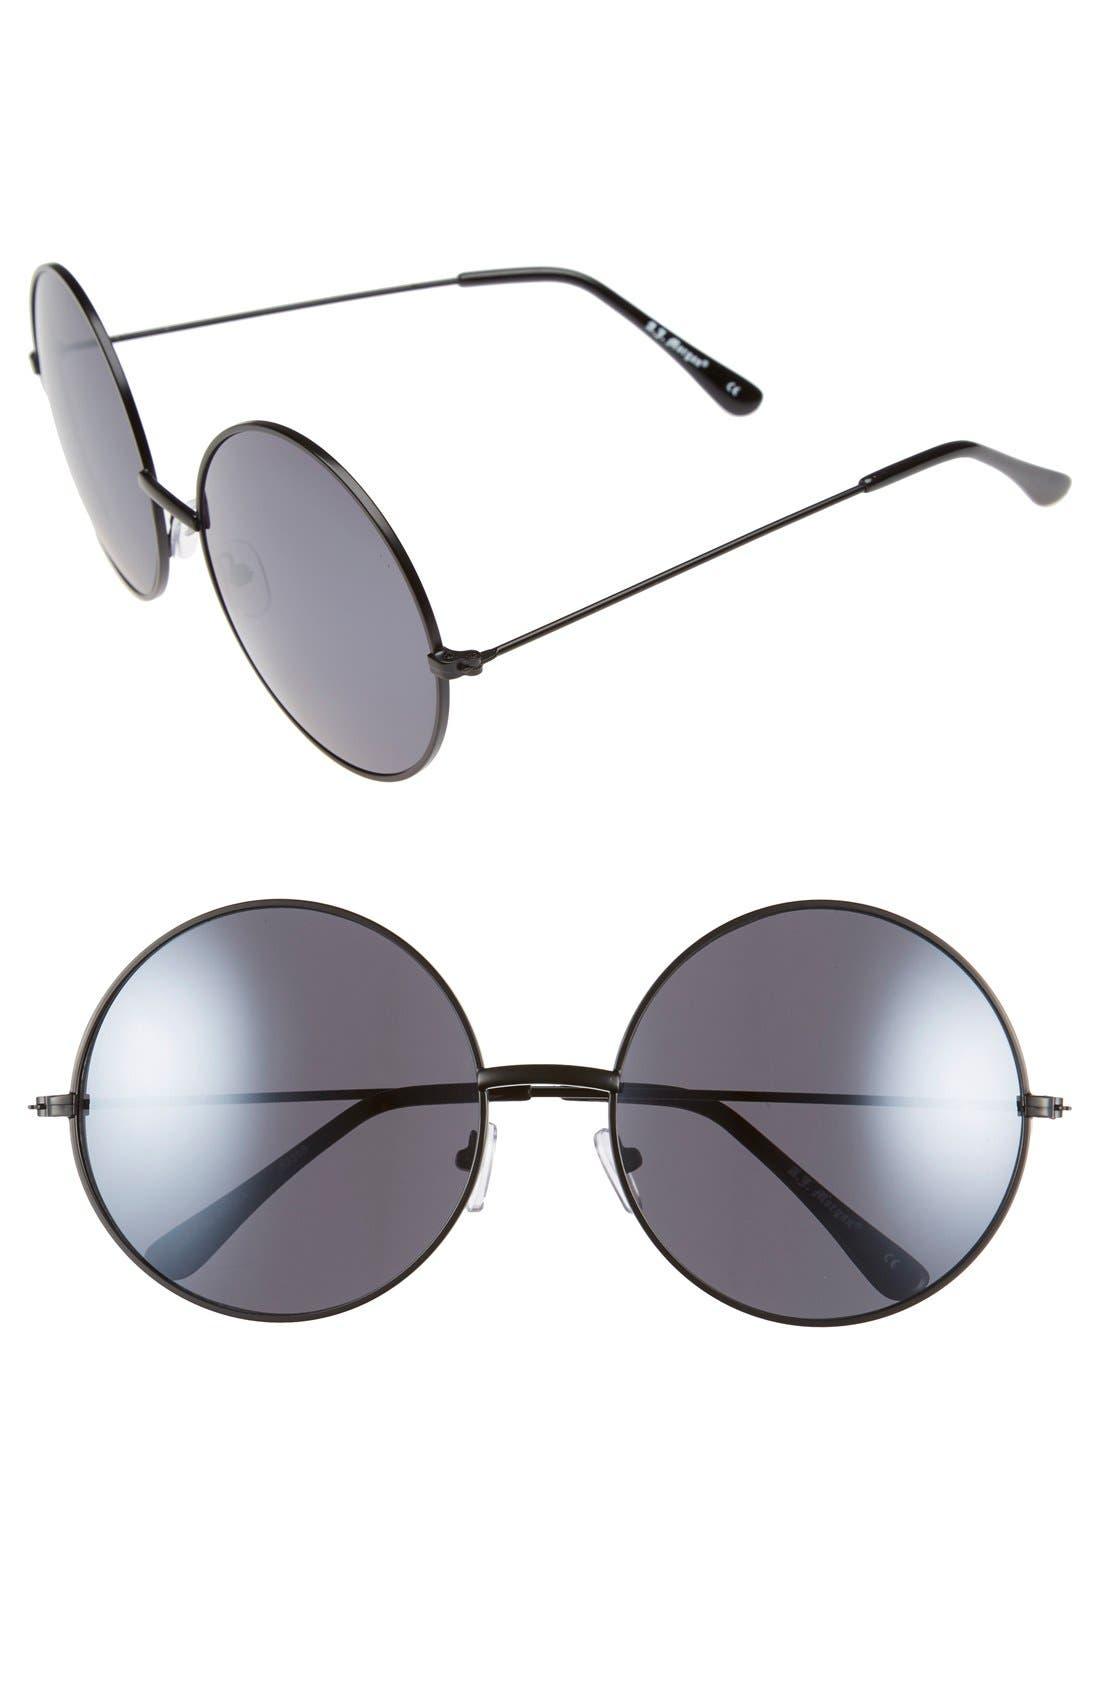 Main Image - A.J. Morgan 'Moonies' 61mm Round Sunglasses